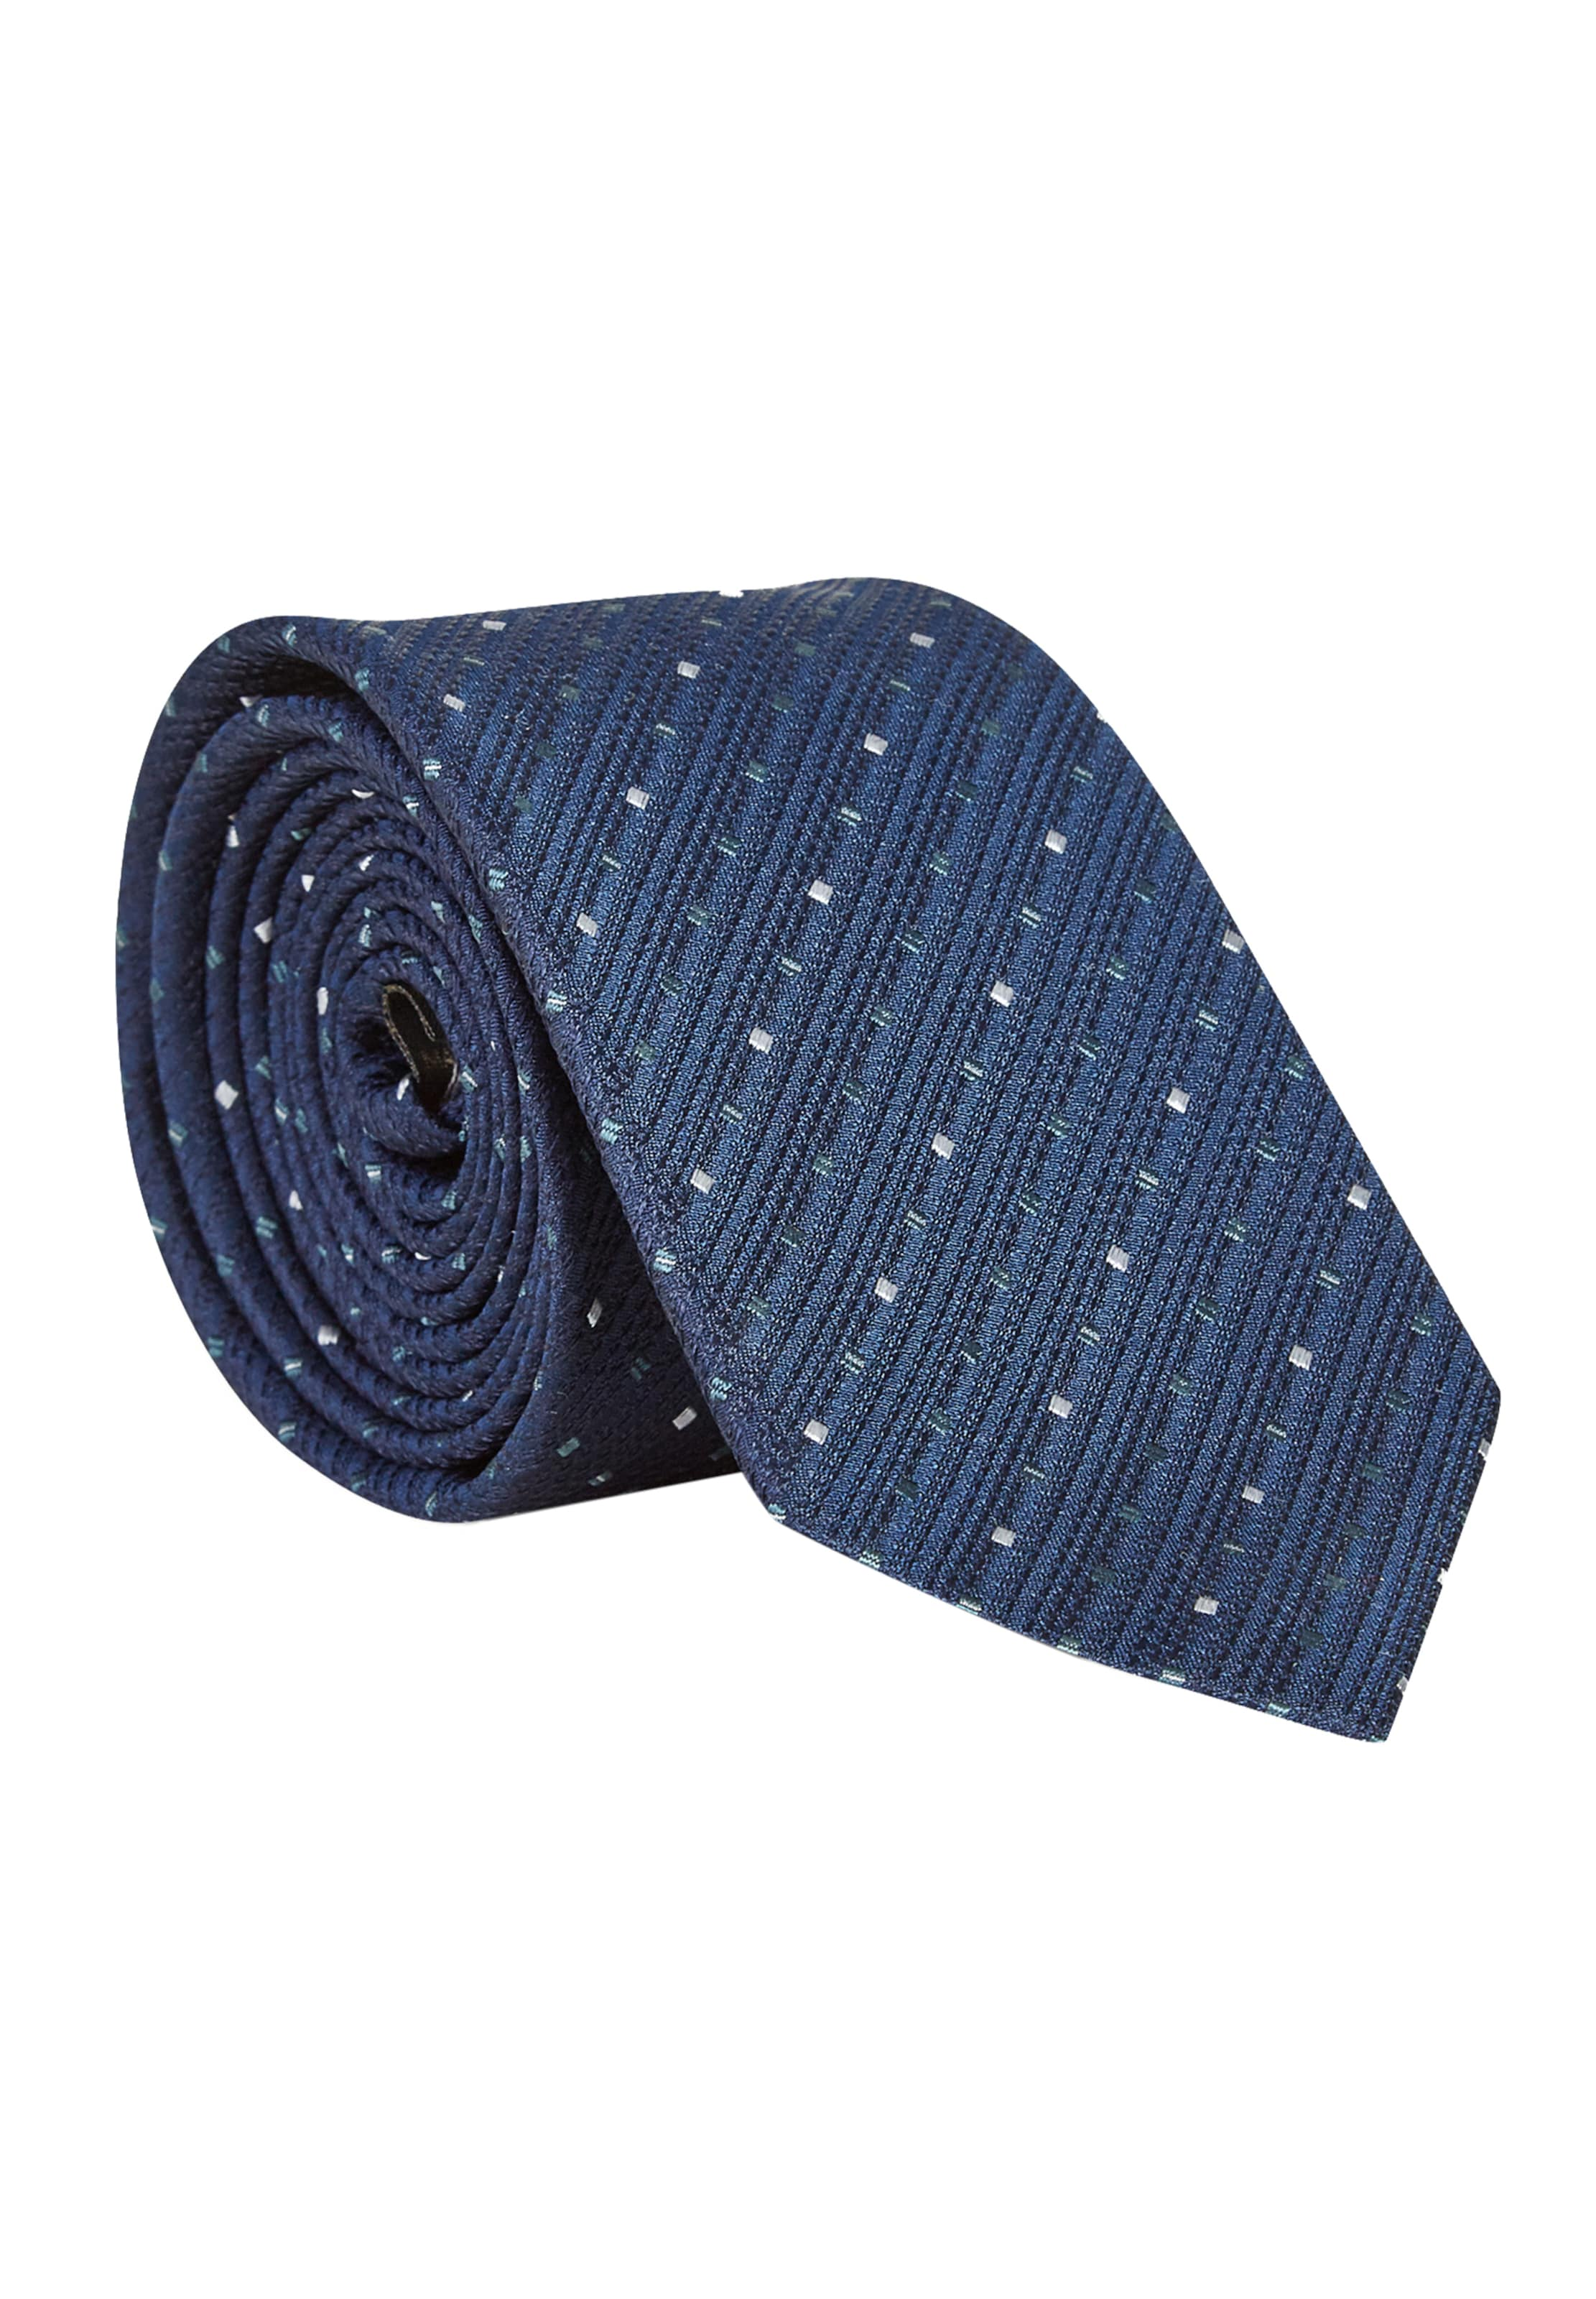 Hechter Business Daniel In krawatte Dunkelblau bfg7y6